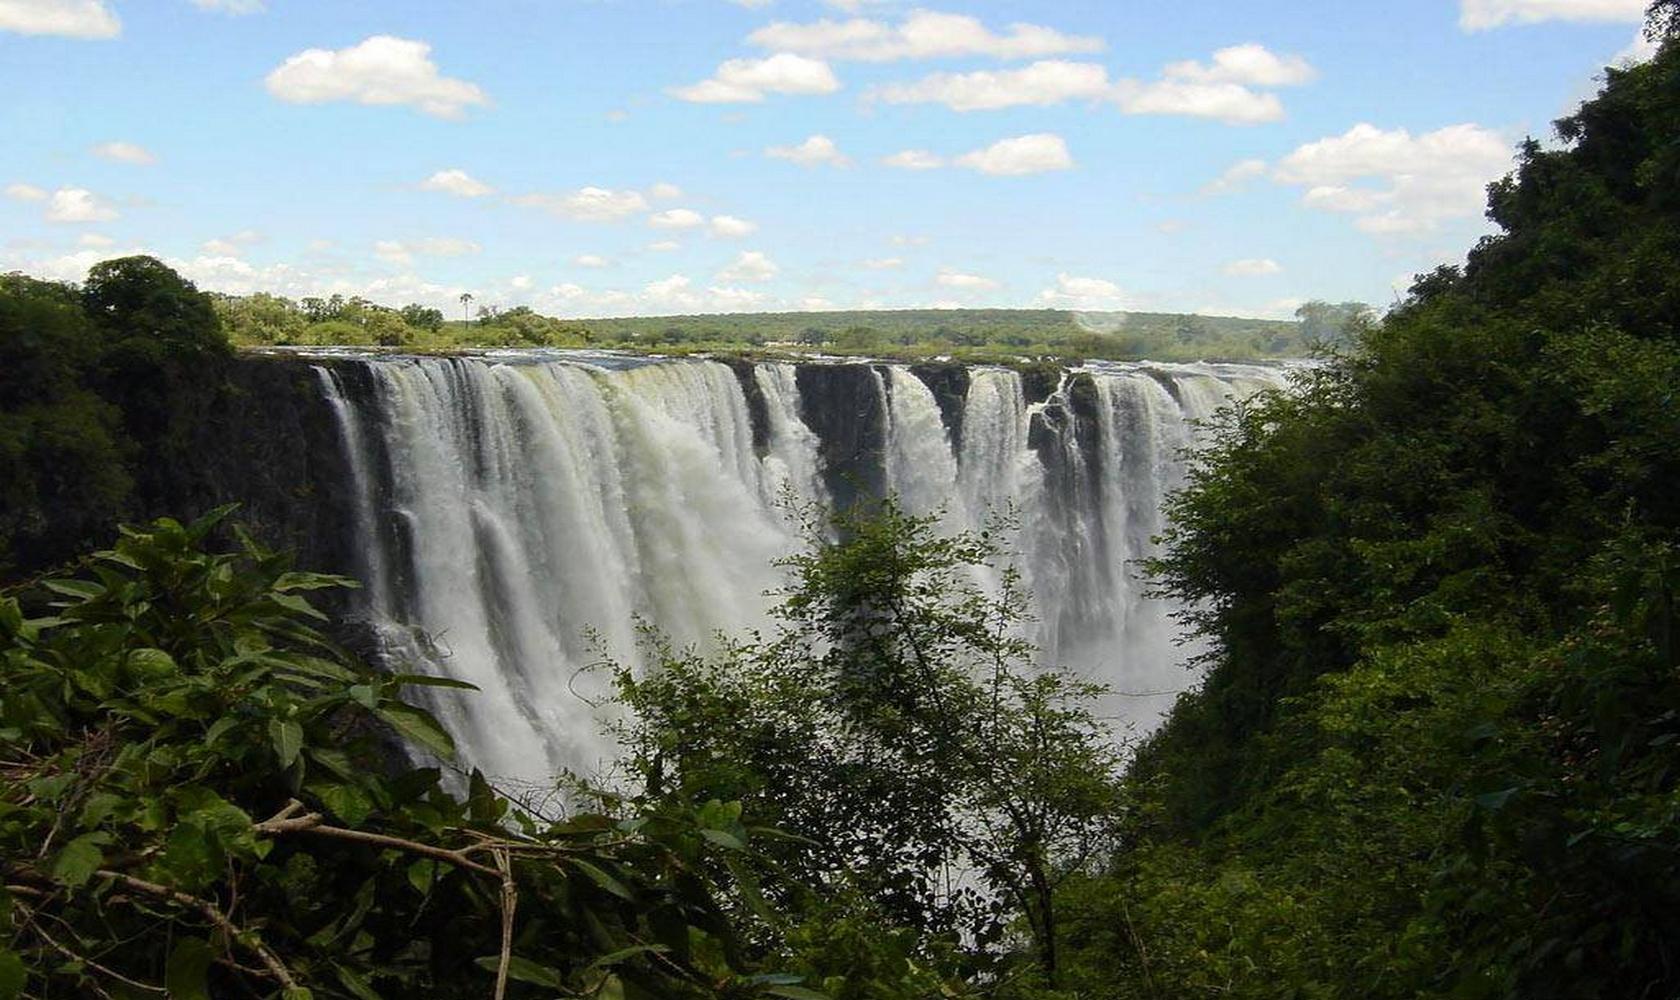 Africa_Chutes_Victoria_015-1680-1000.jpg